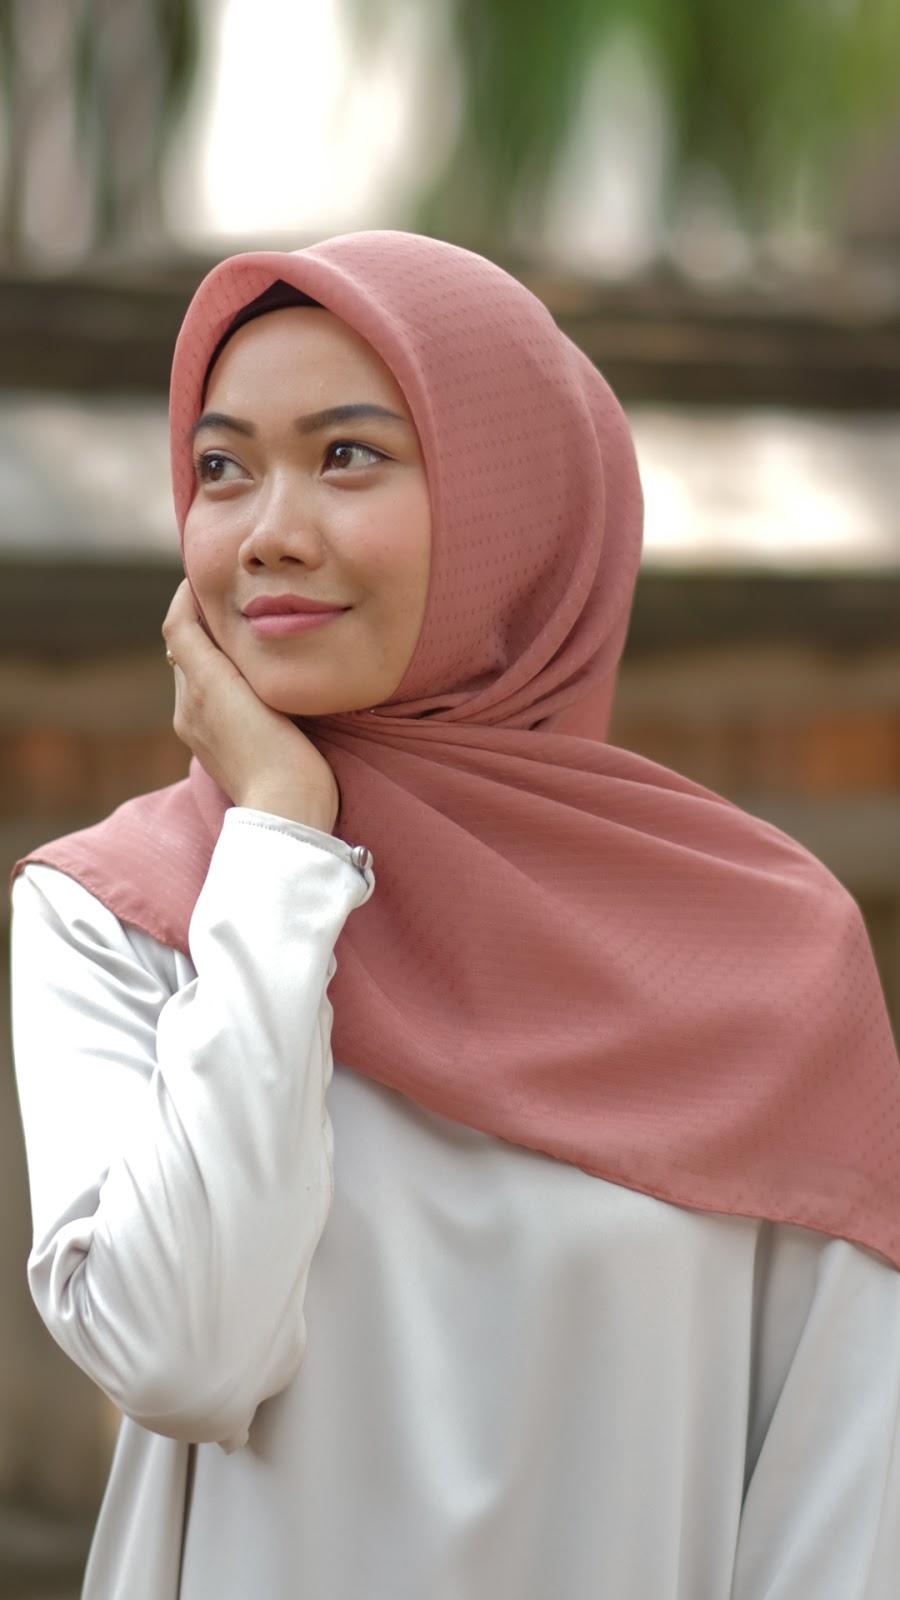 wallpaper muslimah cantik hijab jilbab kuning dan pink